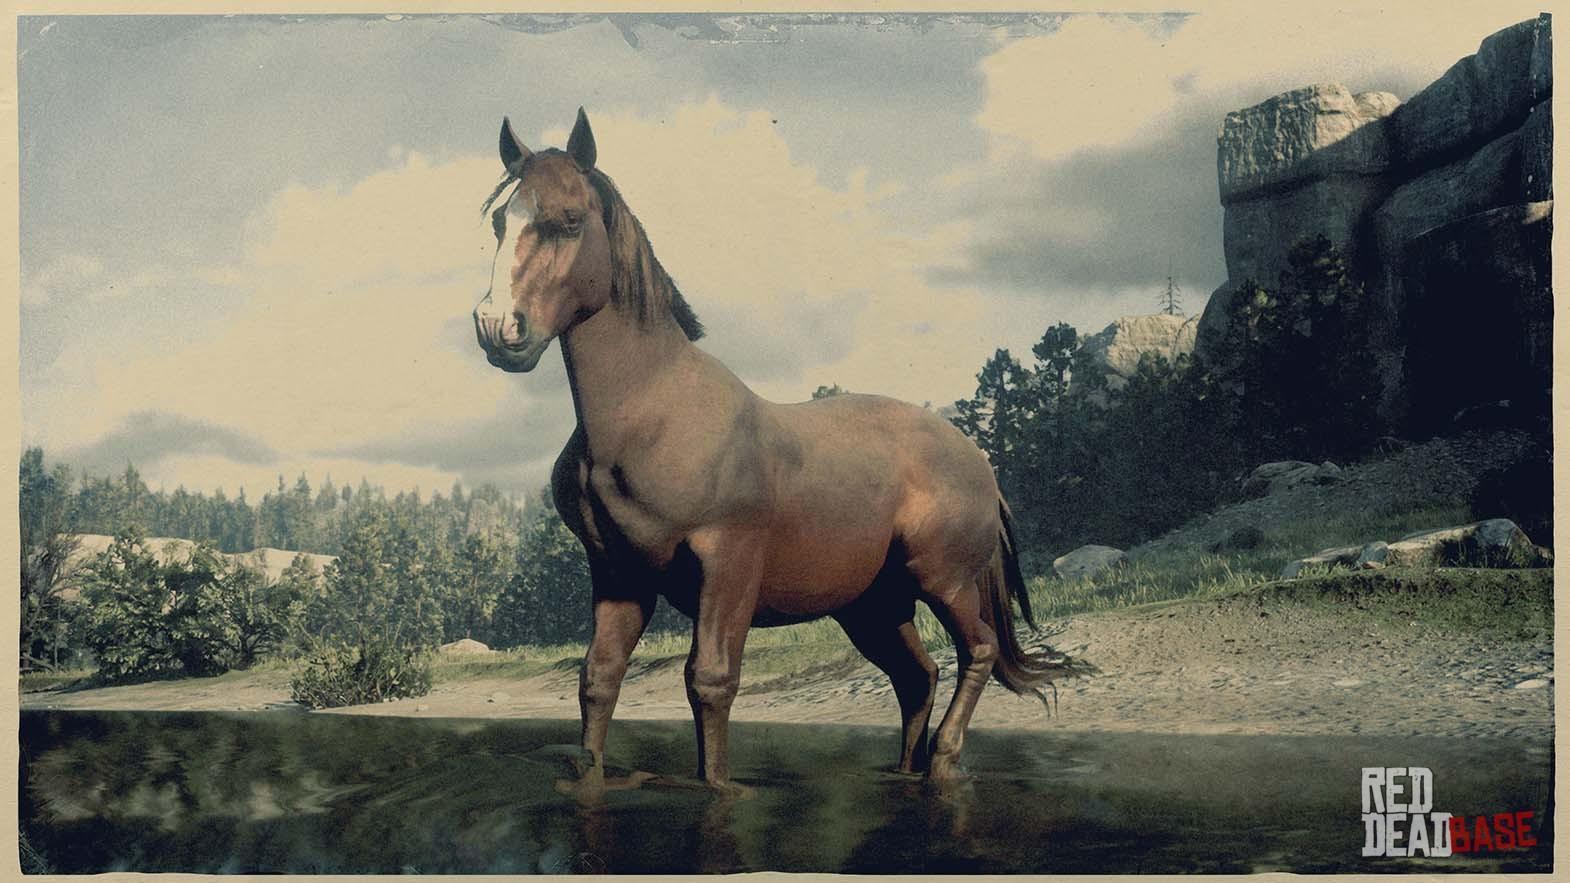 Suffolk Punch Horse Red Dead Redemption 2 Horse Breeds Guide Red Dead Redemption 2 Animals Species Wildlife Database Red Dead Redemption 2